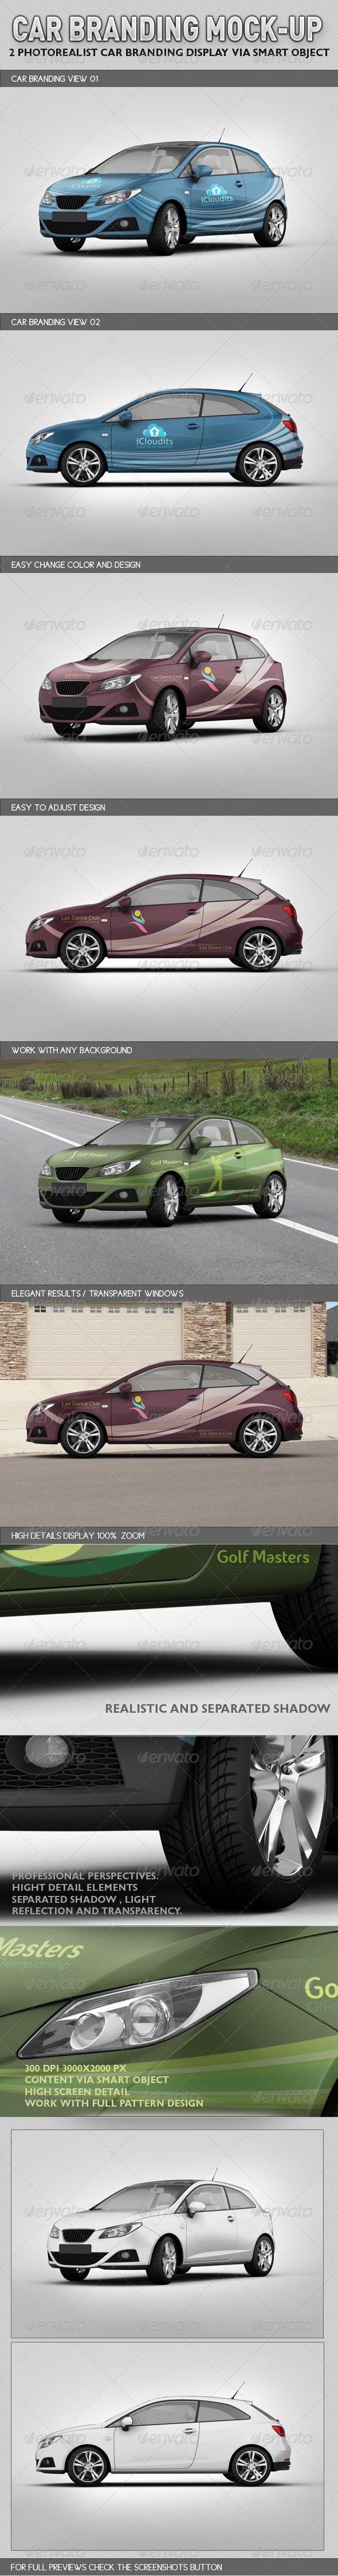 GraphicRiver Car Branding Mock-up 3125312